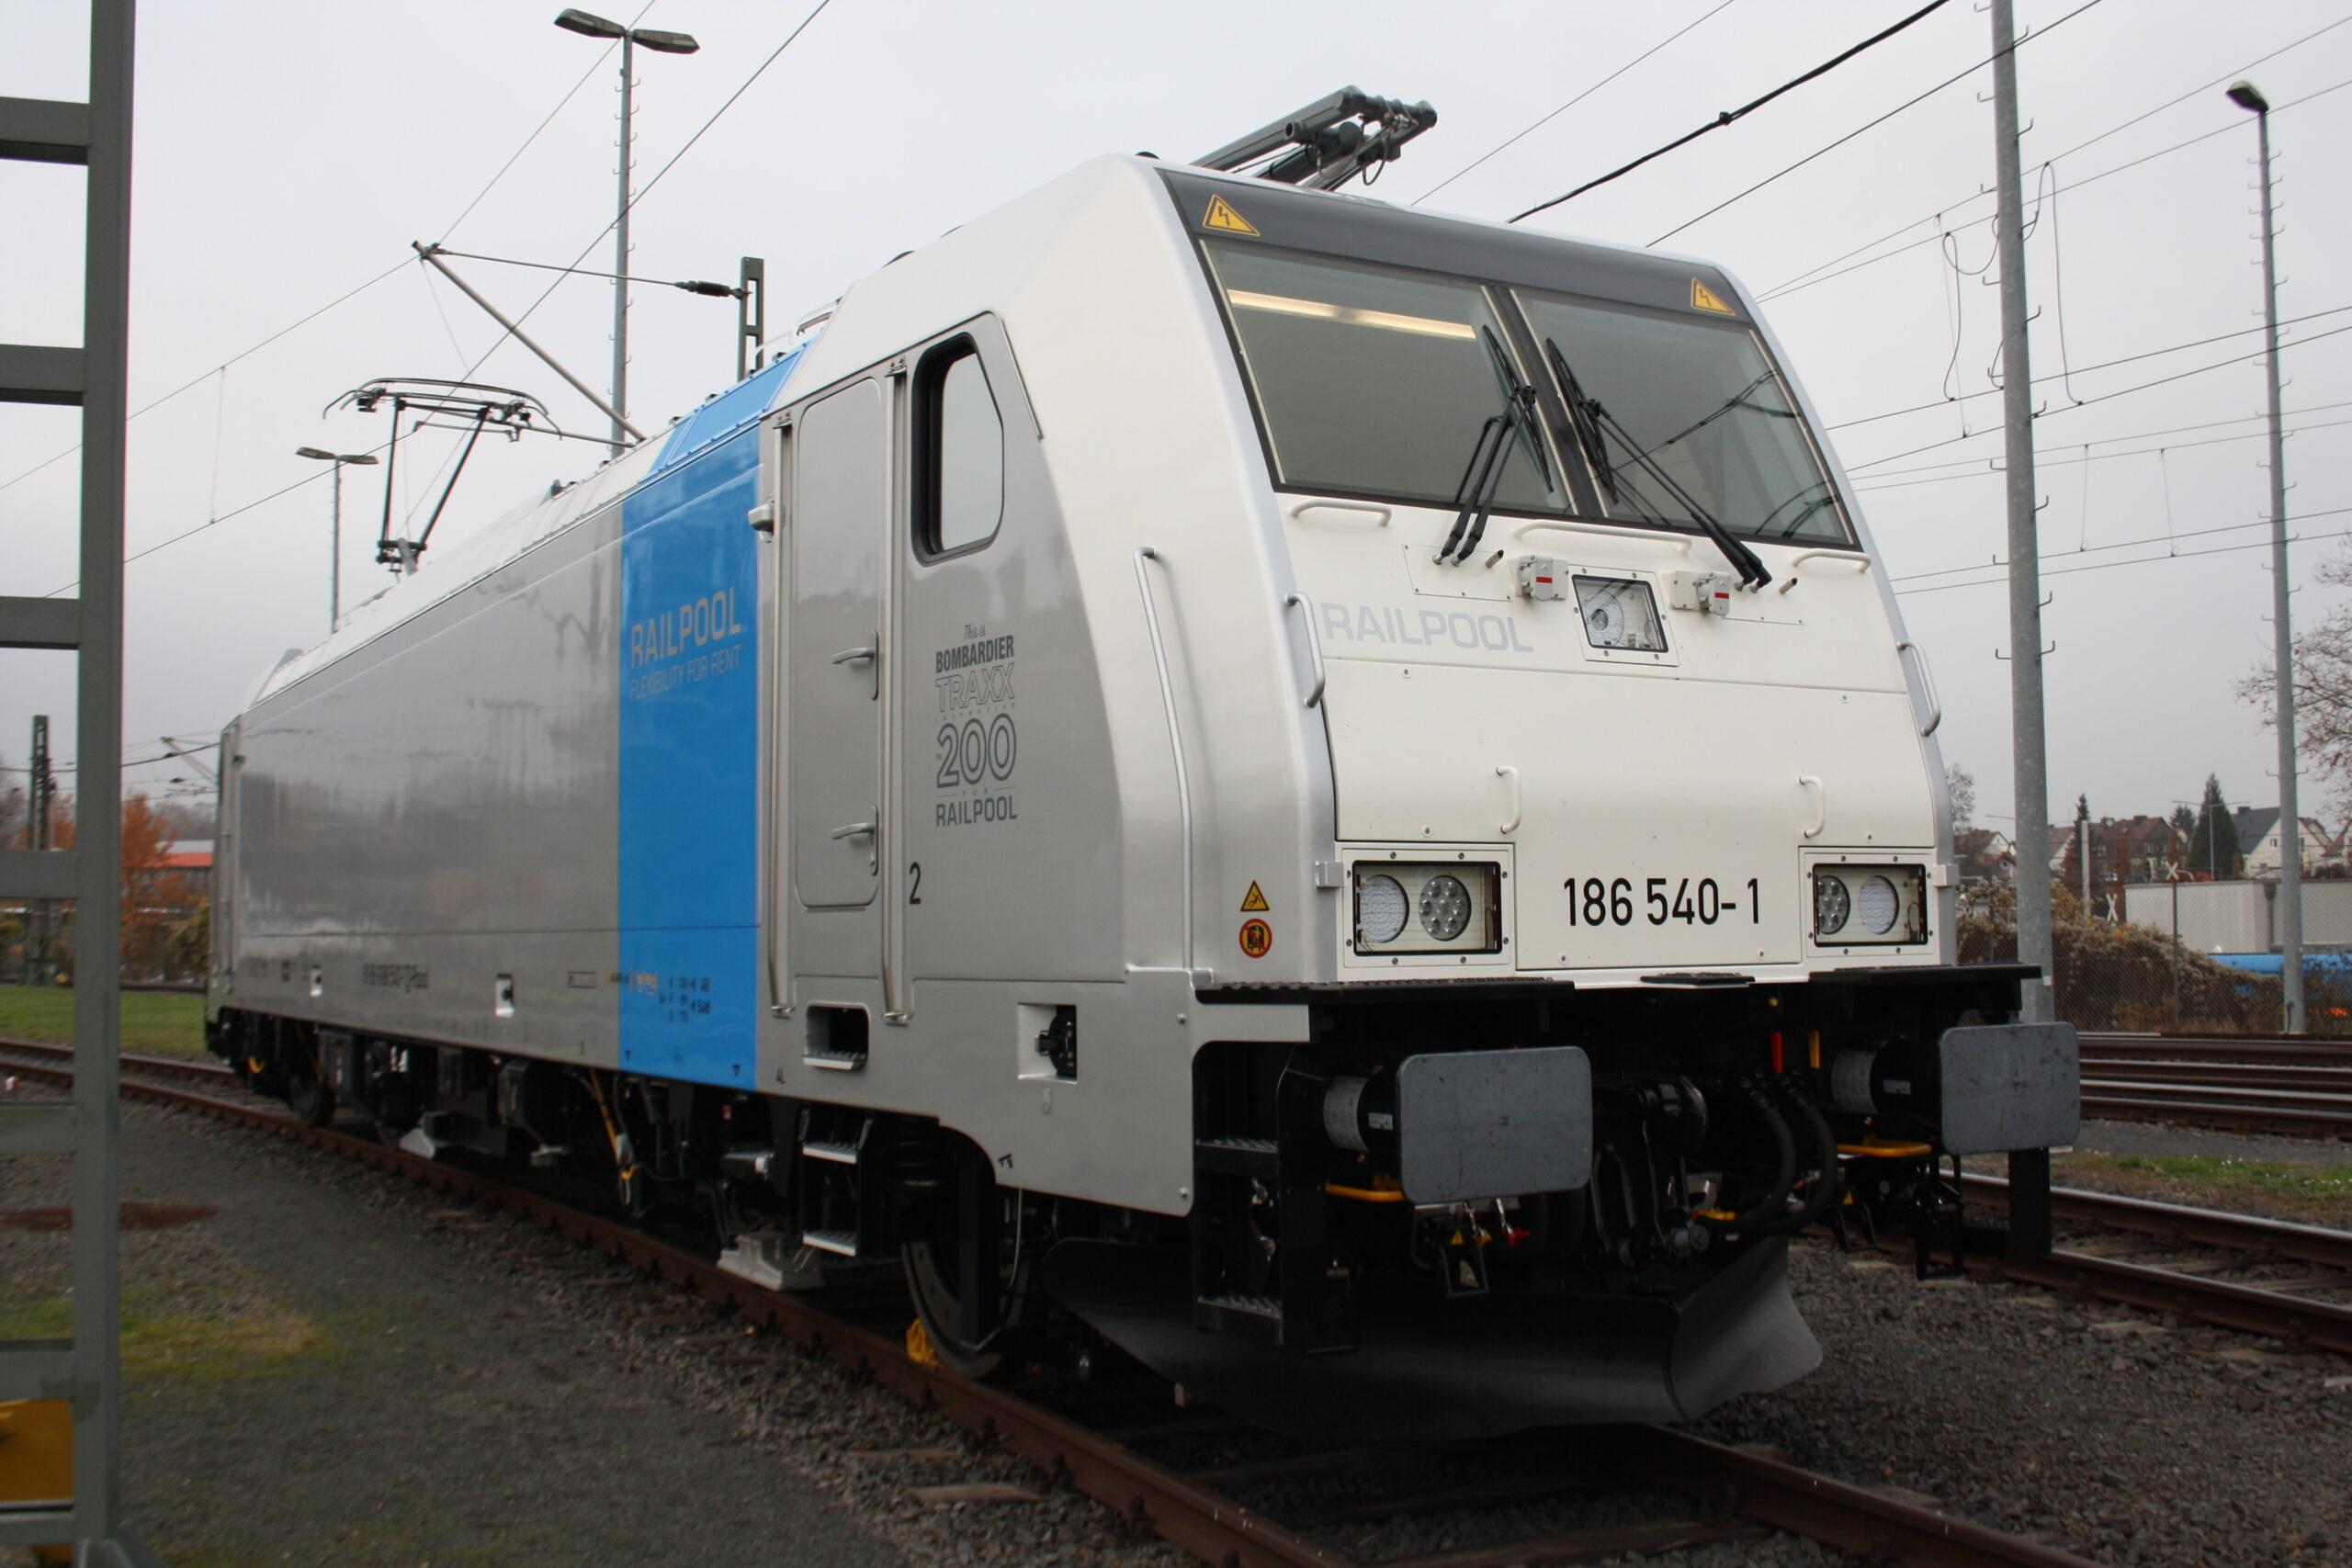 200th Bombardier TRAXX locomotive for Railpool